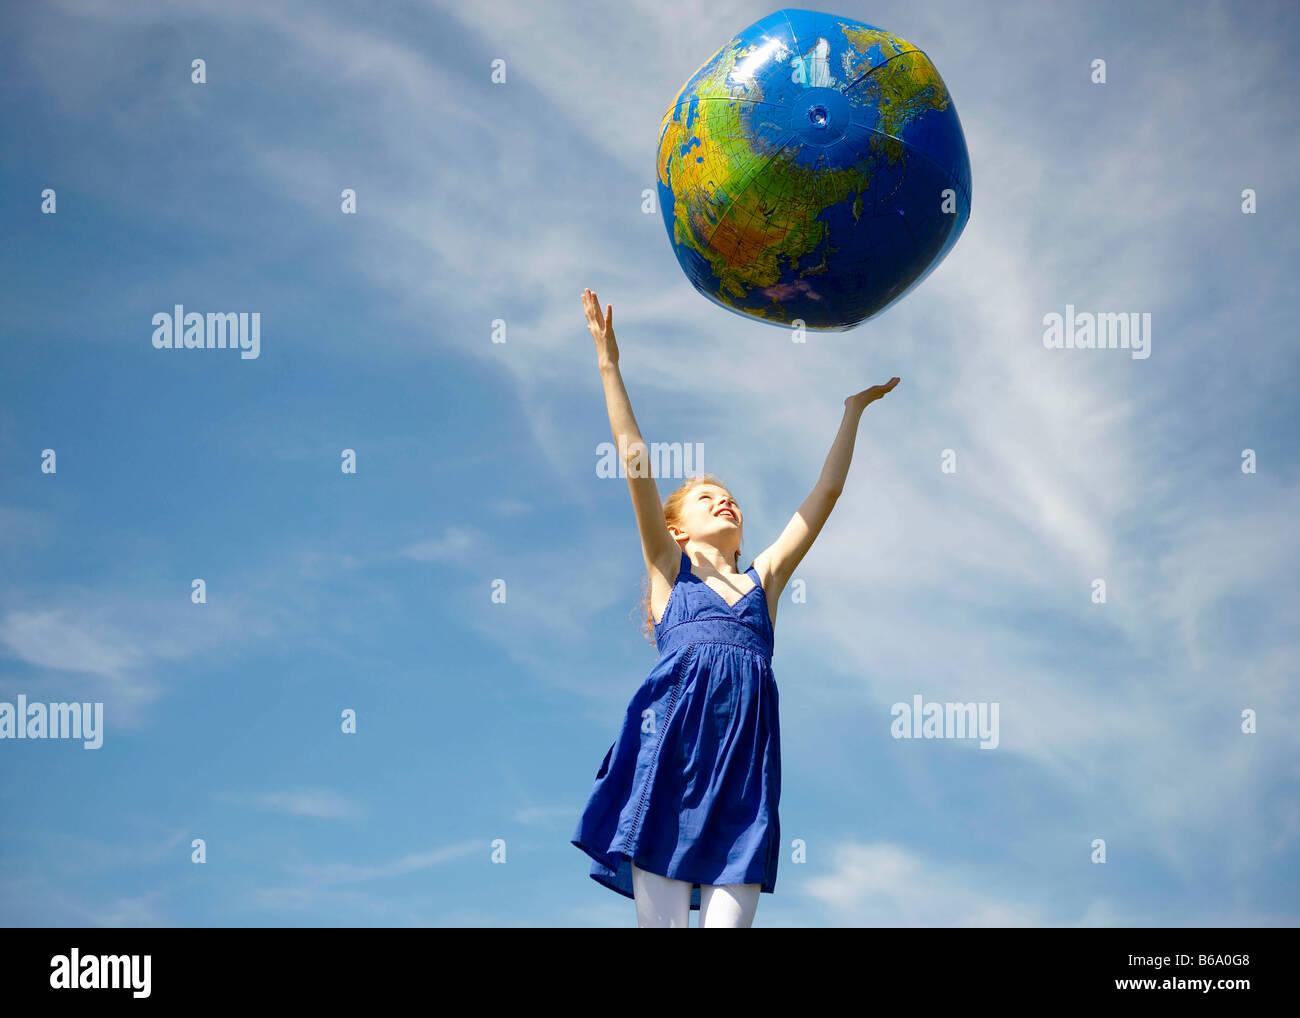 Young girl throwing inflatable globe - Stock Image